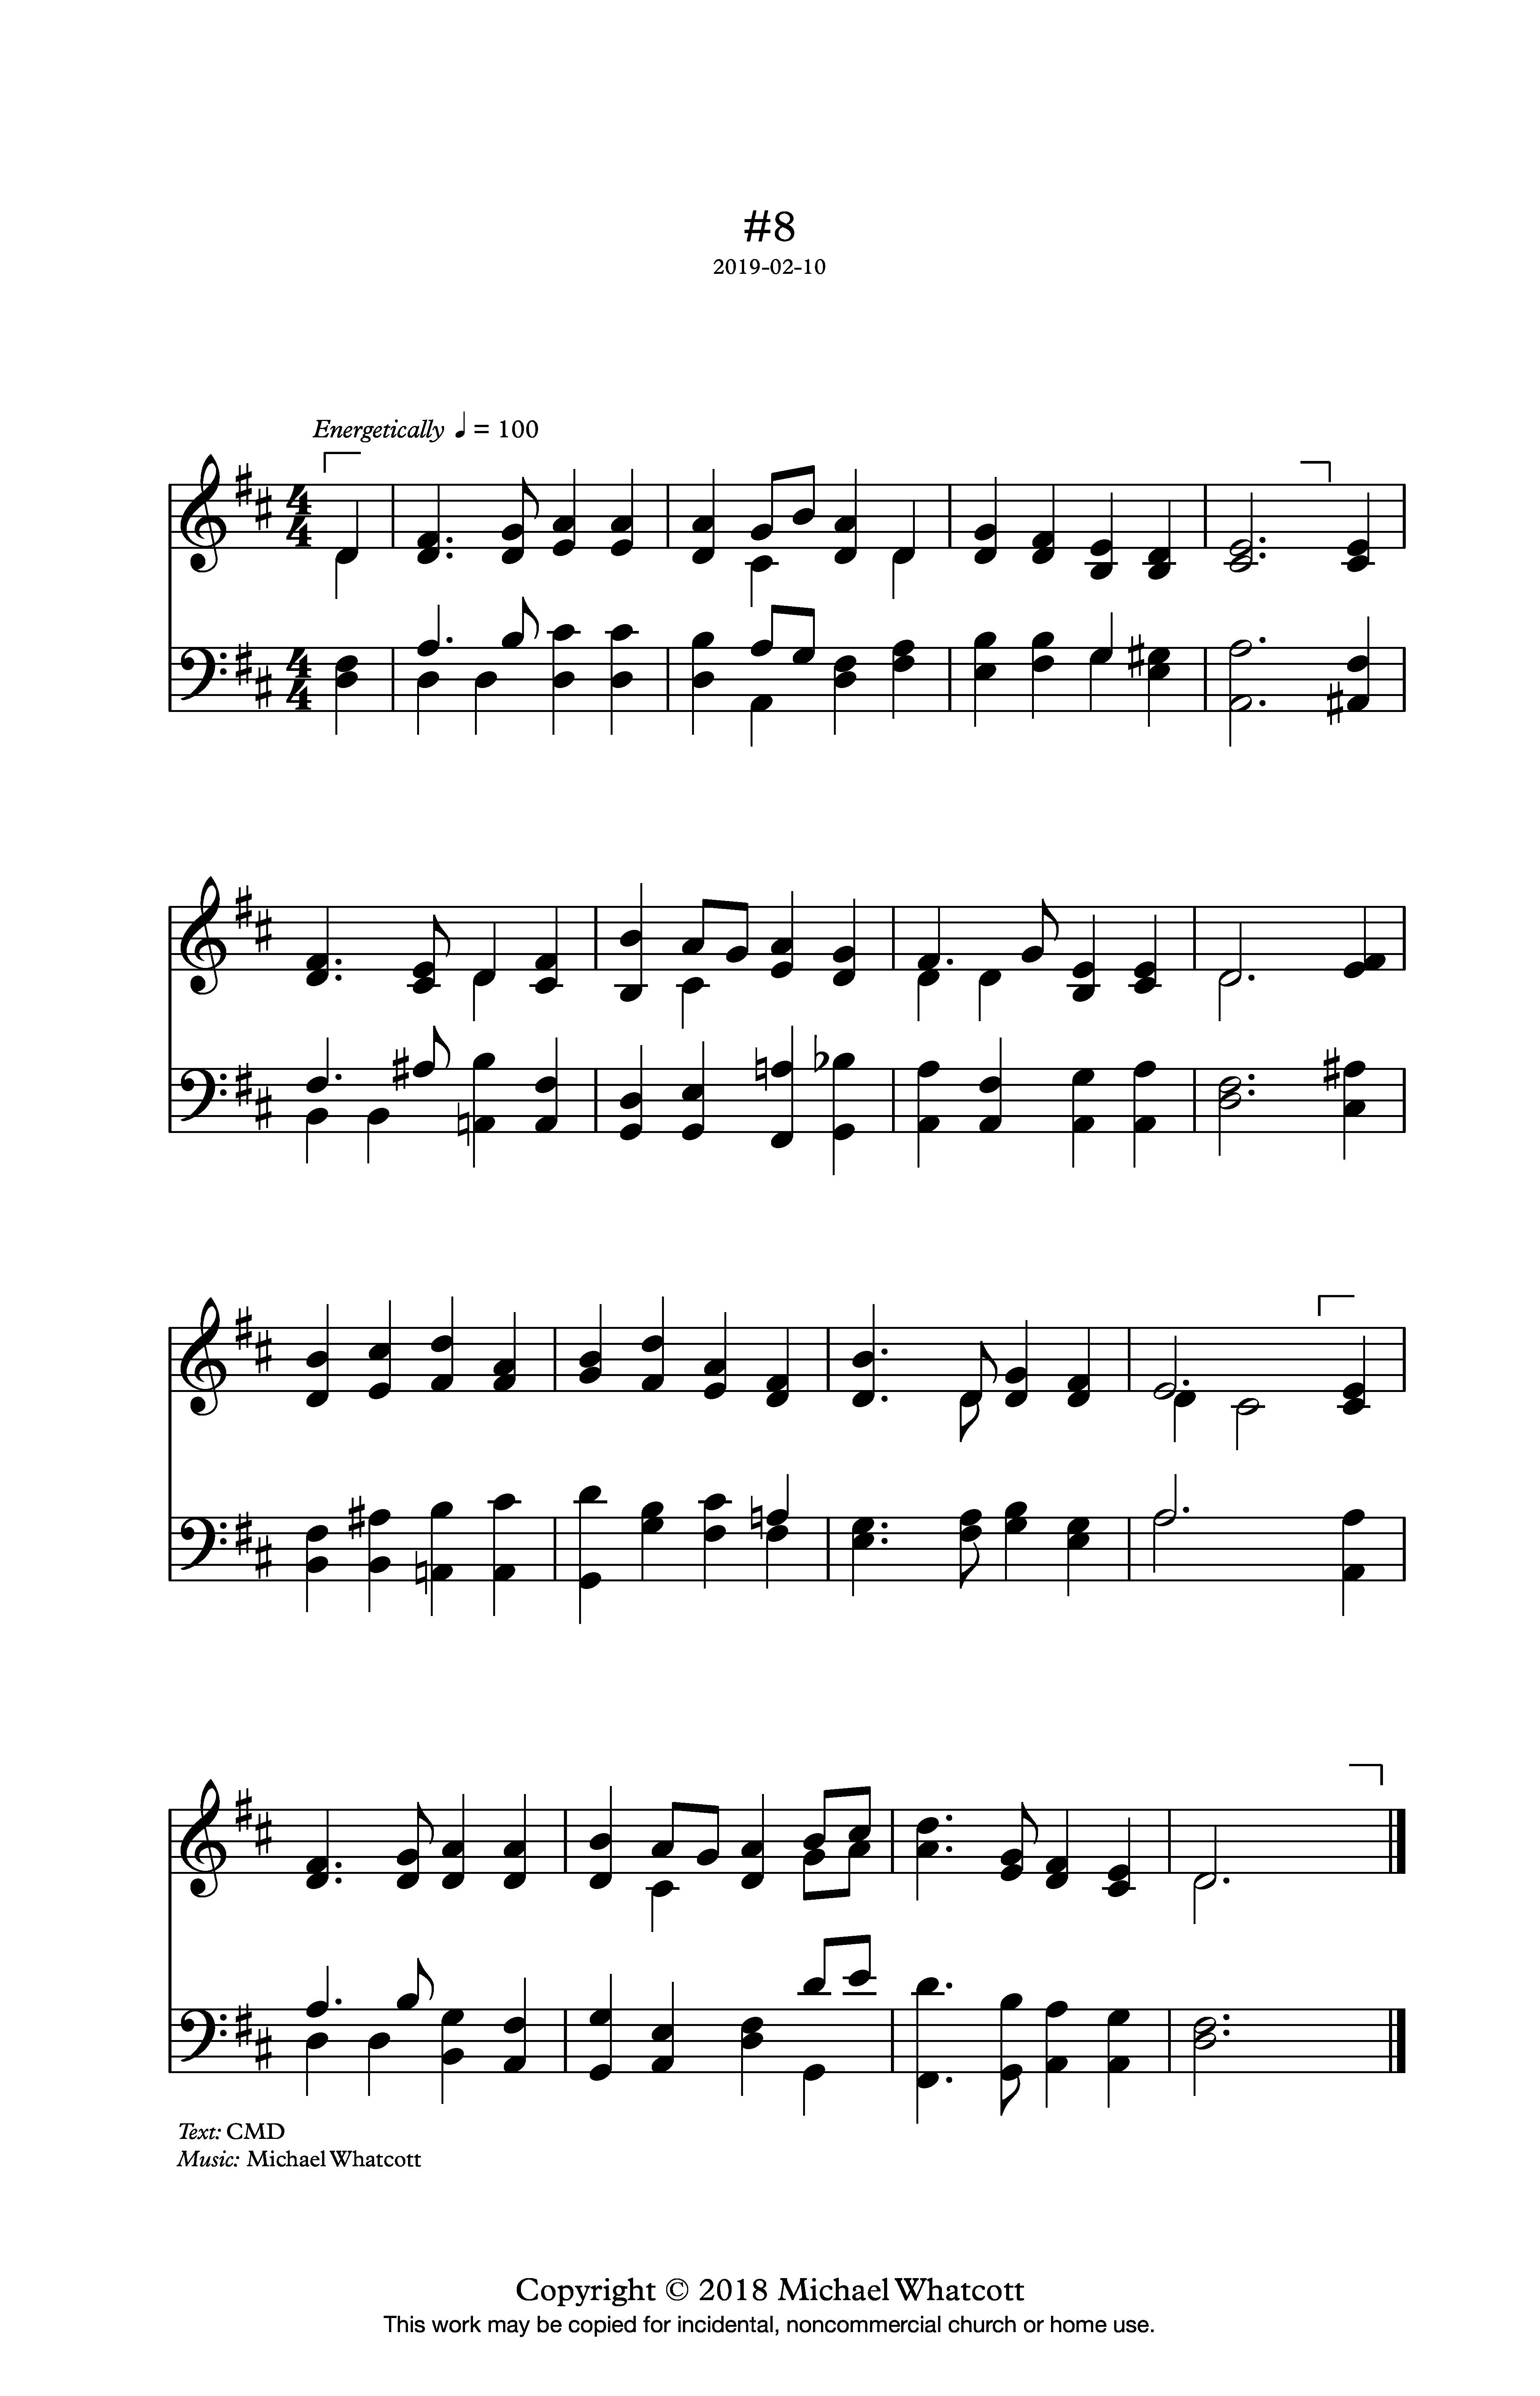 Michael Whatcott - Hymn #8